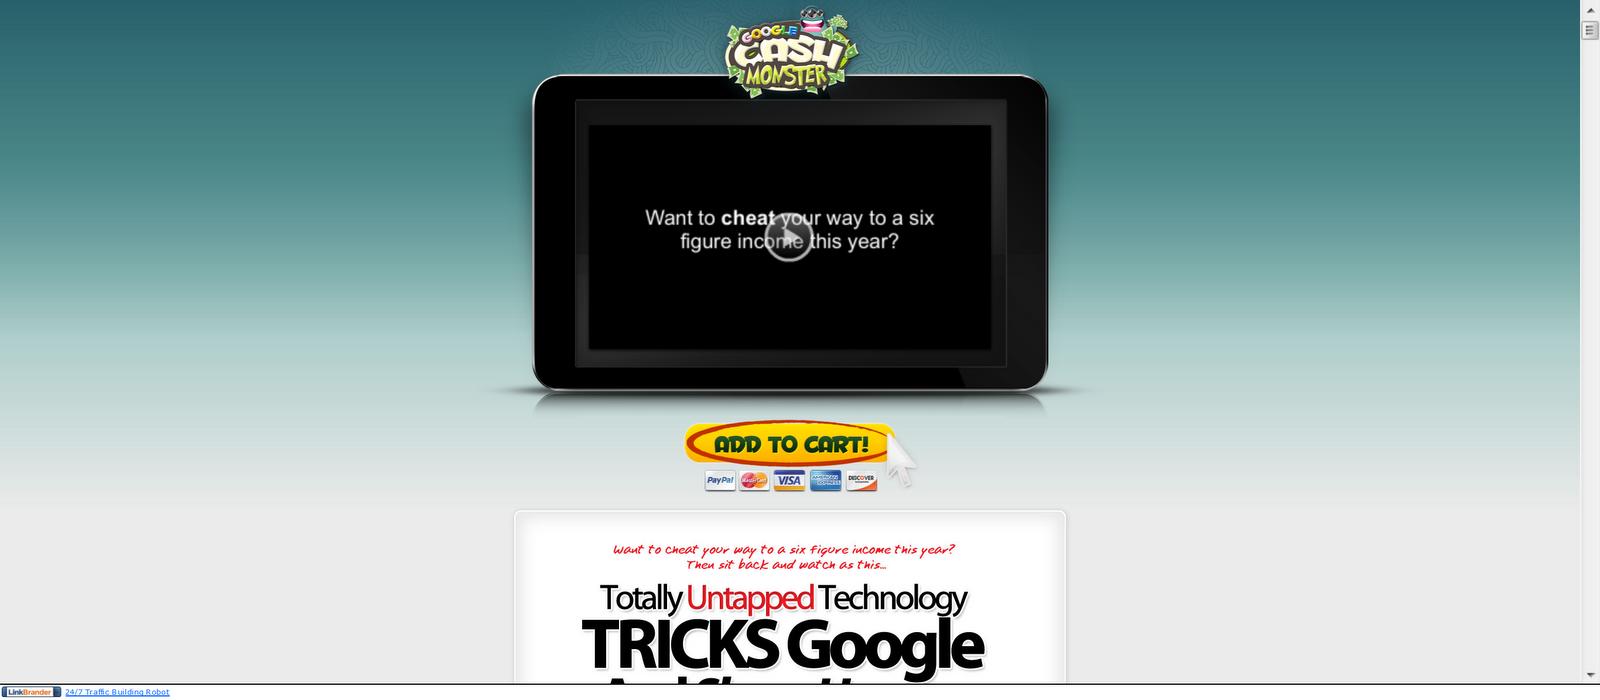 Google Cash Monster Review: 2011